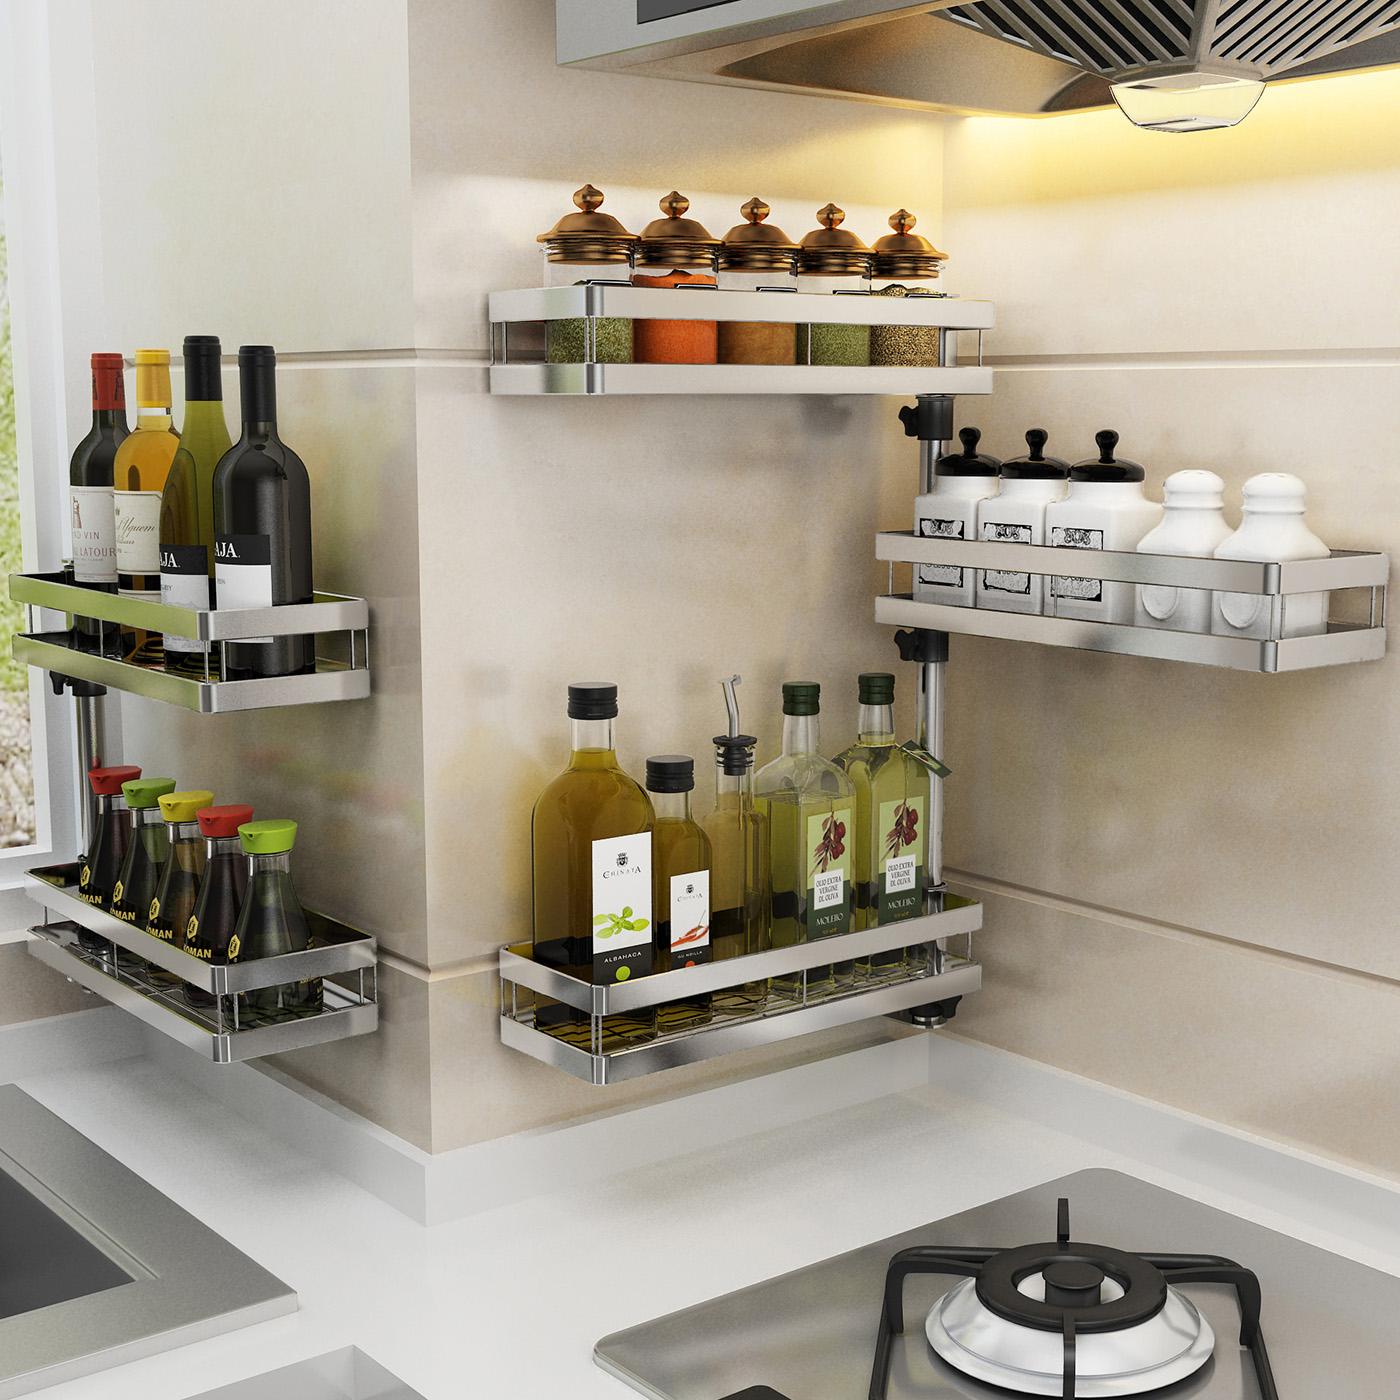 Free punch stainless steel kitchen racks oil salt sauce vinegar storage rack wall mounted corner rotation space saving